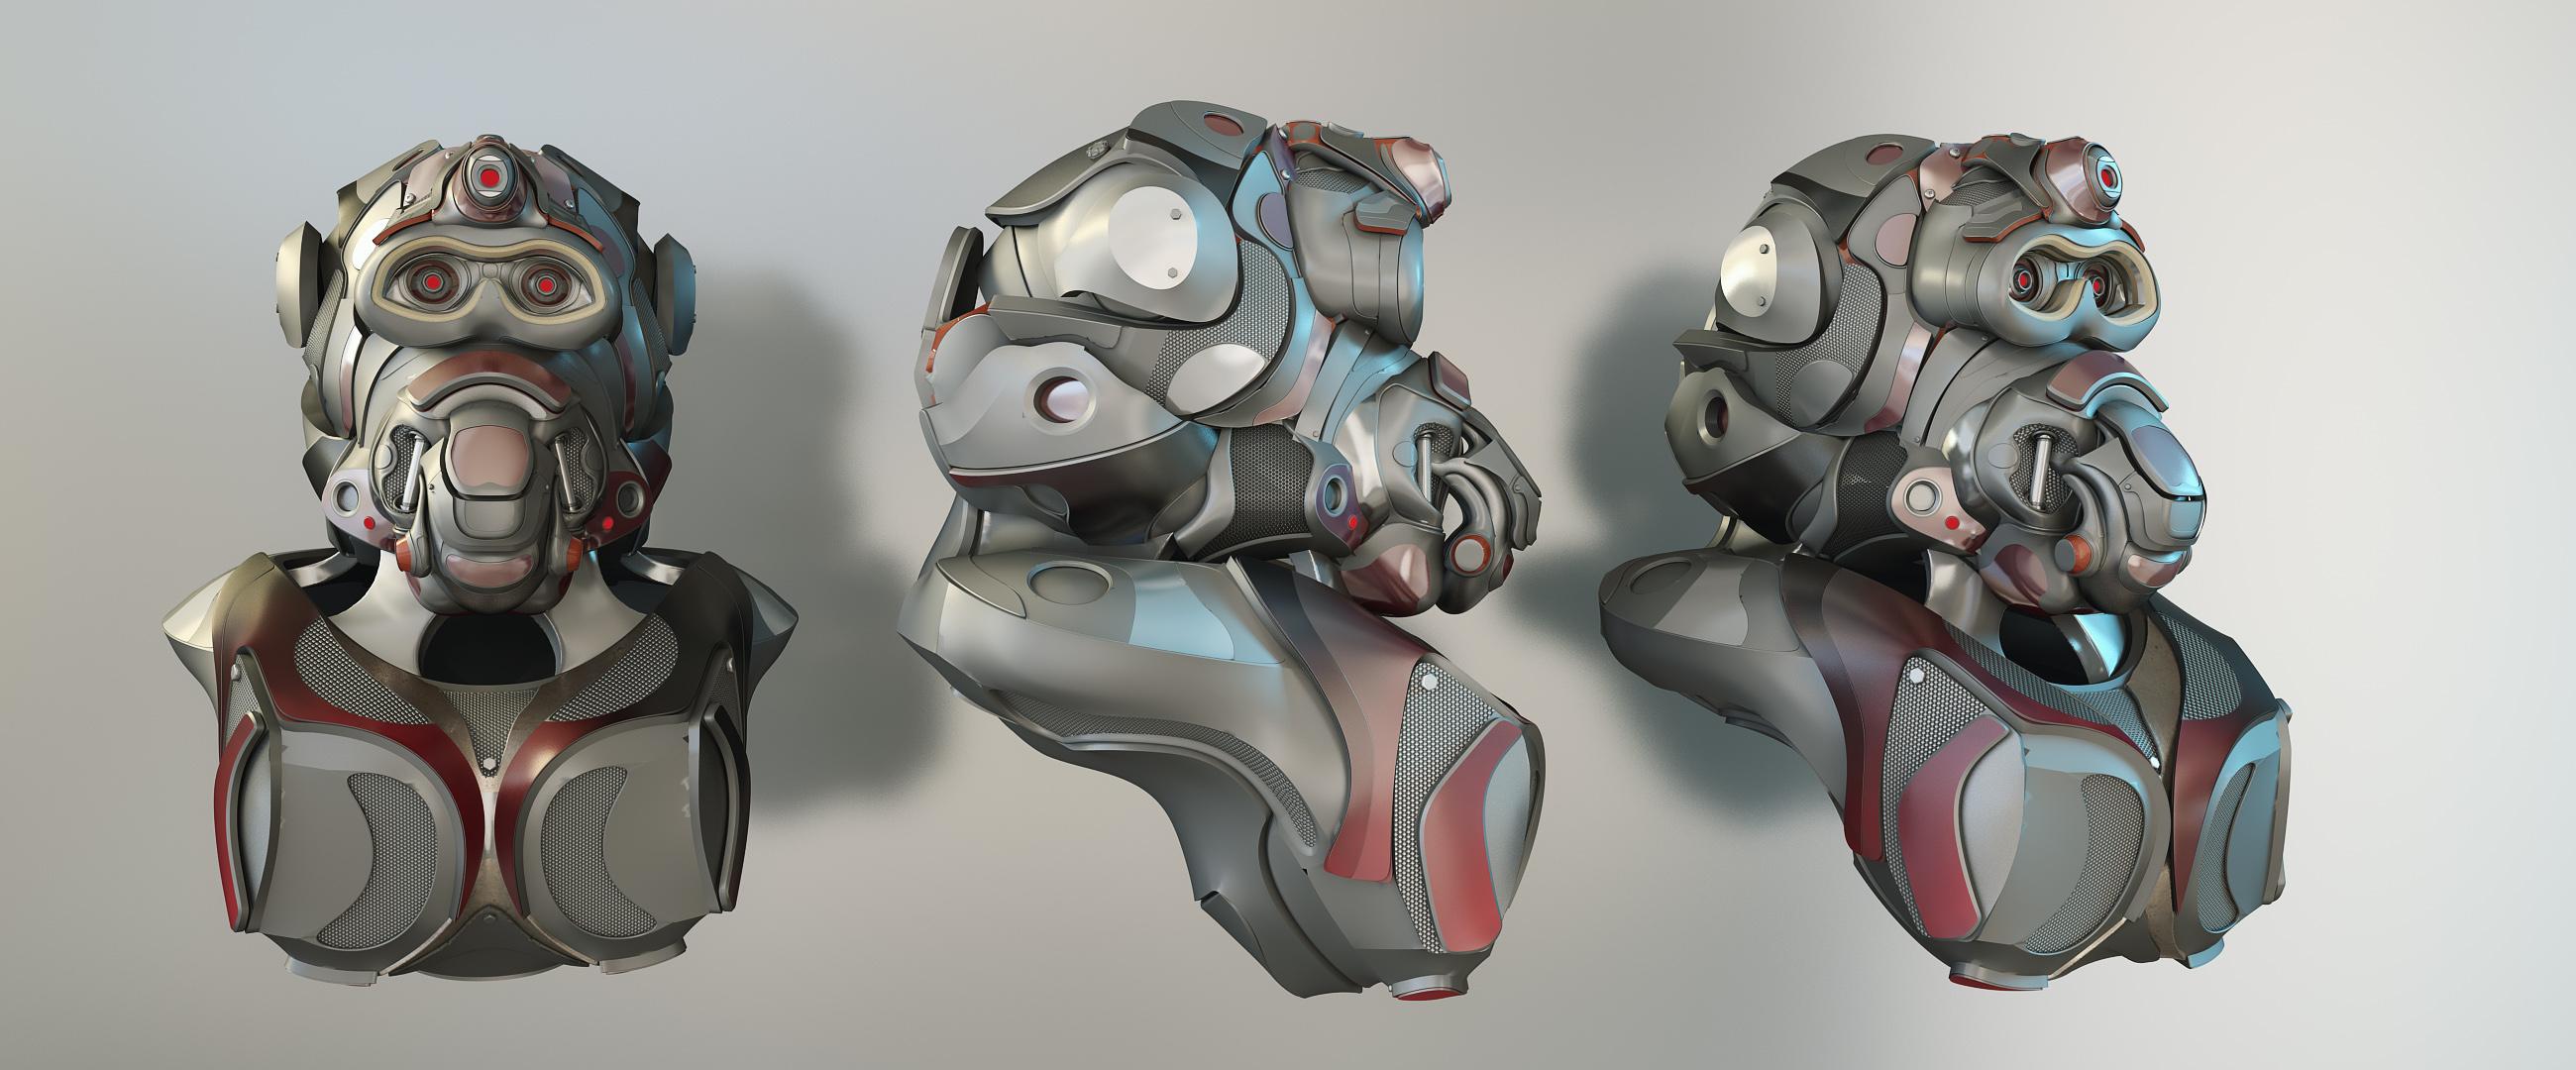 Monkey Armor by sanfranguy